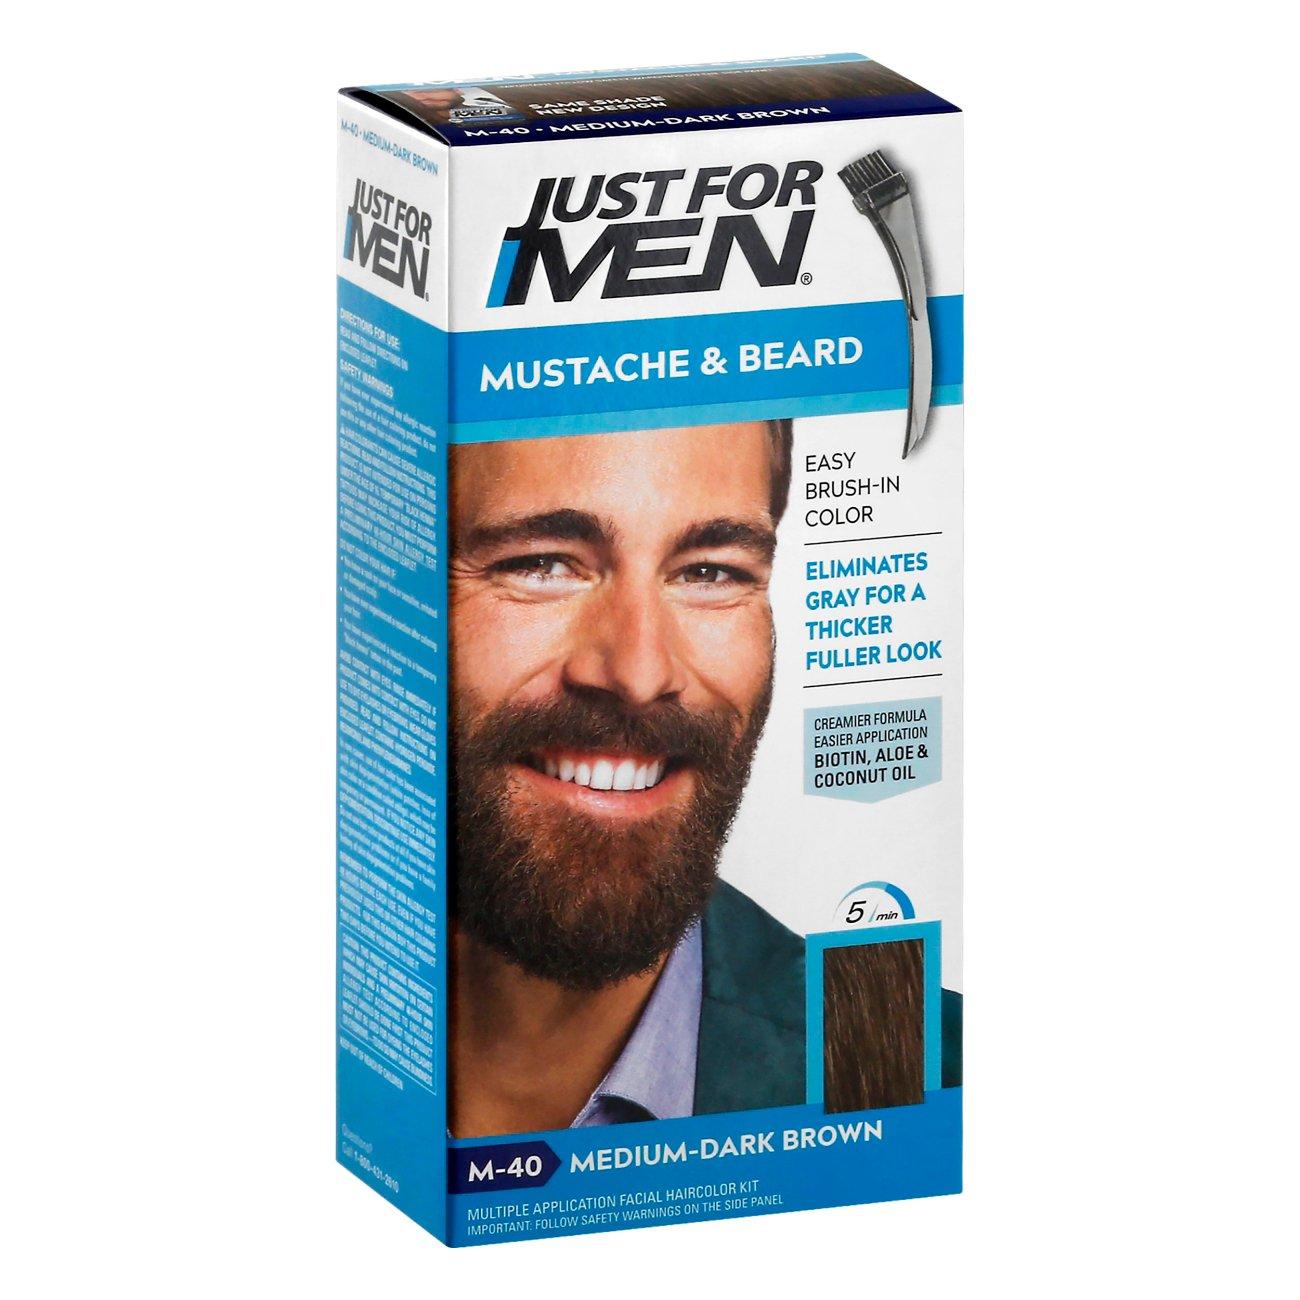 Just For Men Mustache & Beard Medium-Dark Brown M-40 Brush-In Color ...